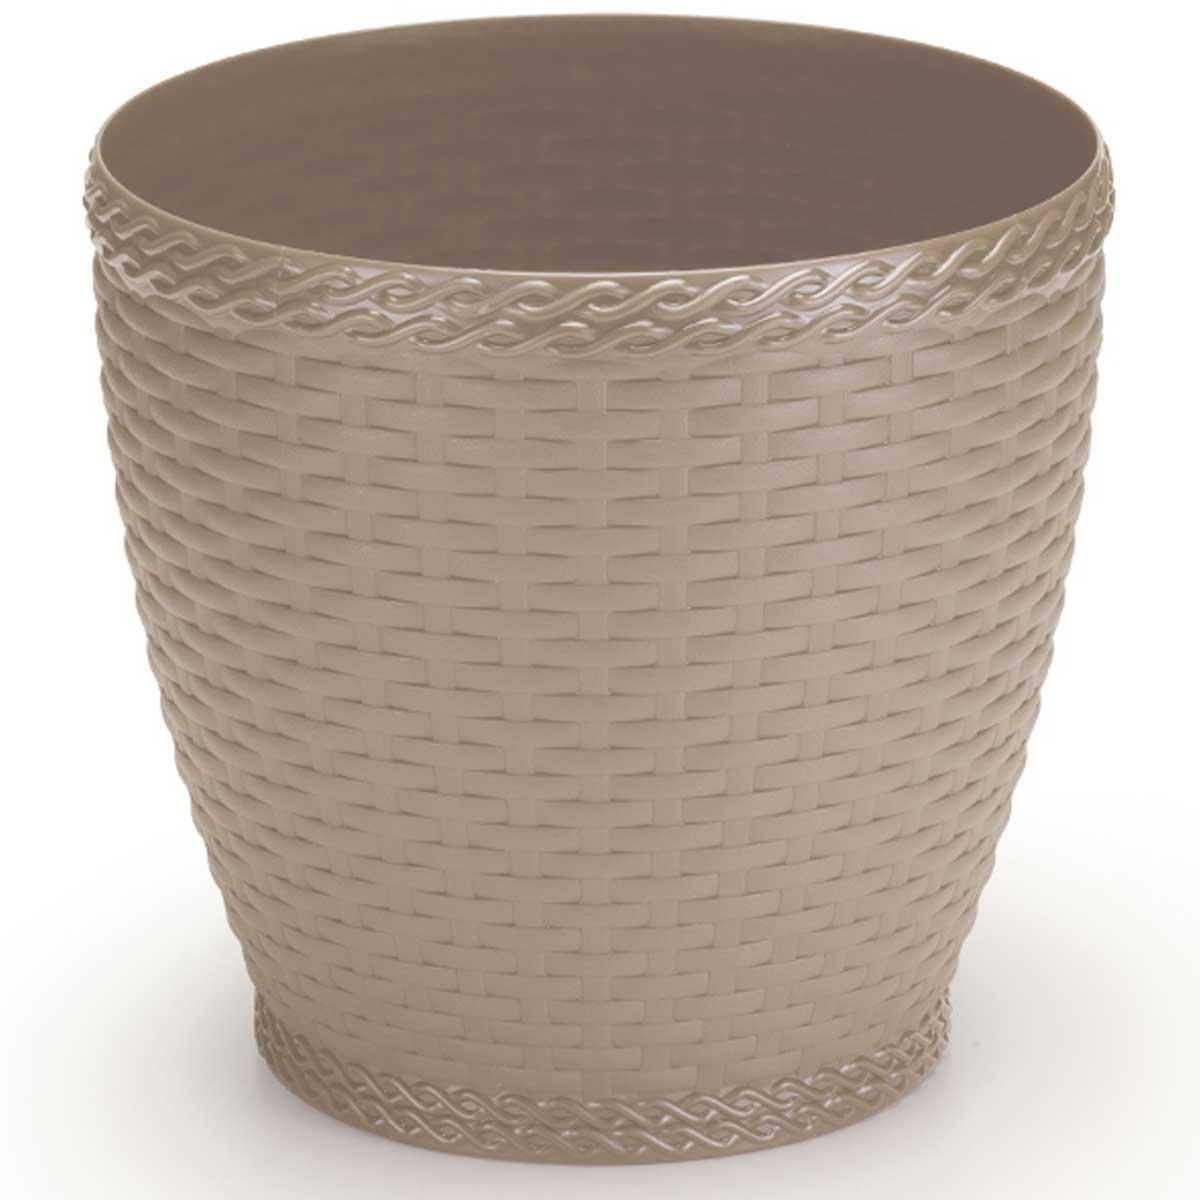 Cachepô vaso de plástico redondo 4,6L 21x20cm Rattan Palha